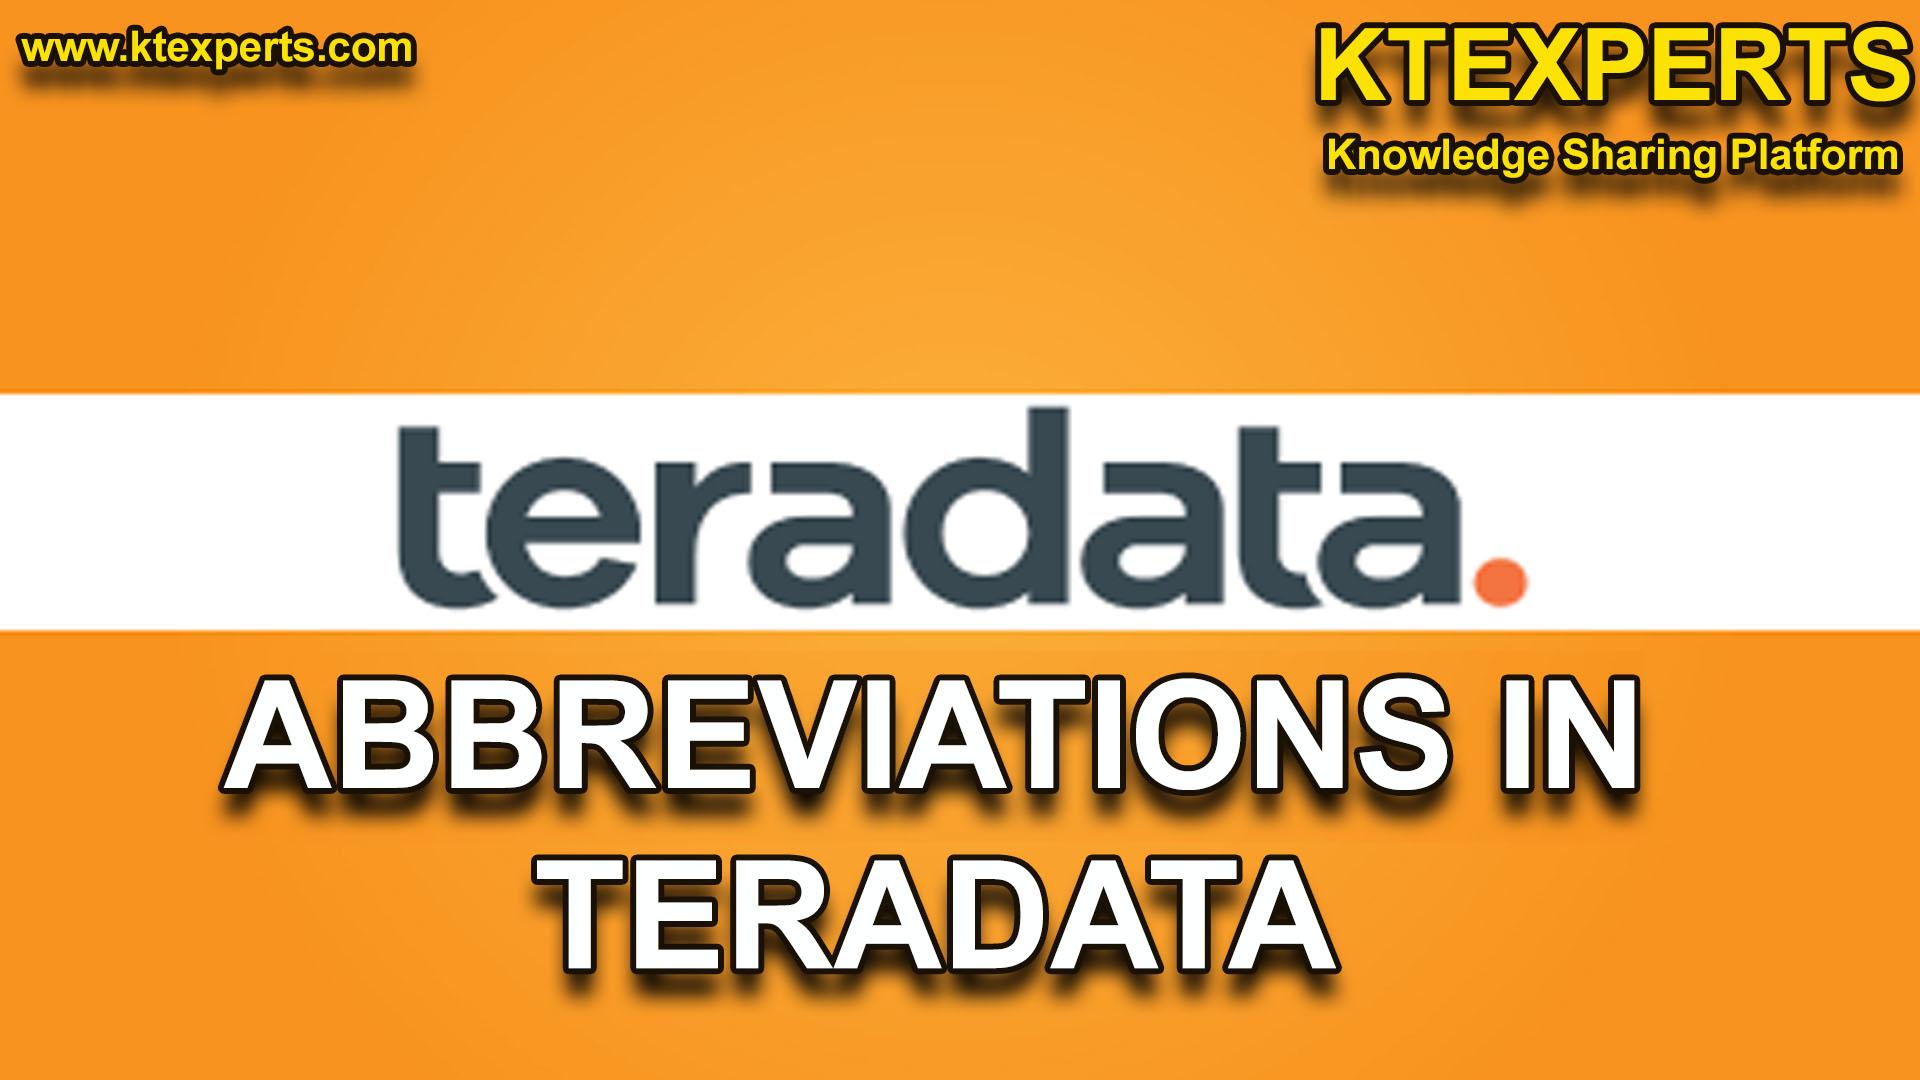 ABBREVIATIONS IN TERADATA